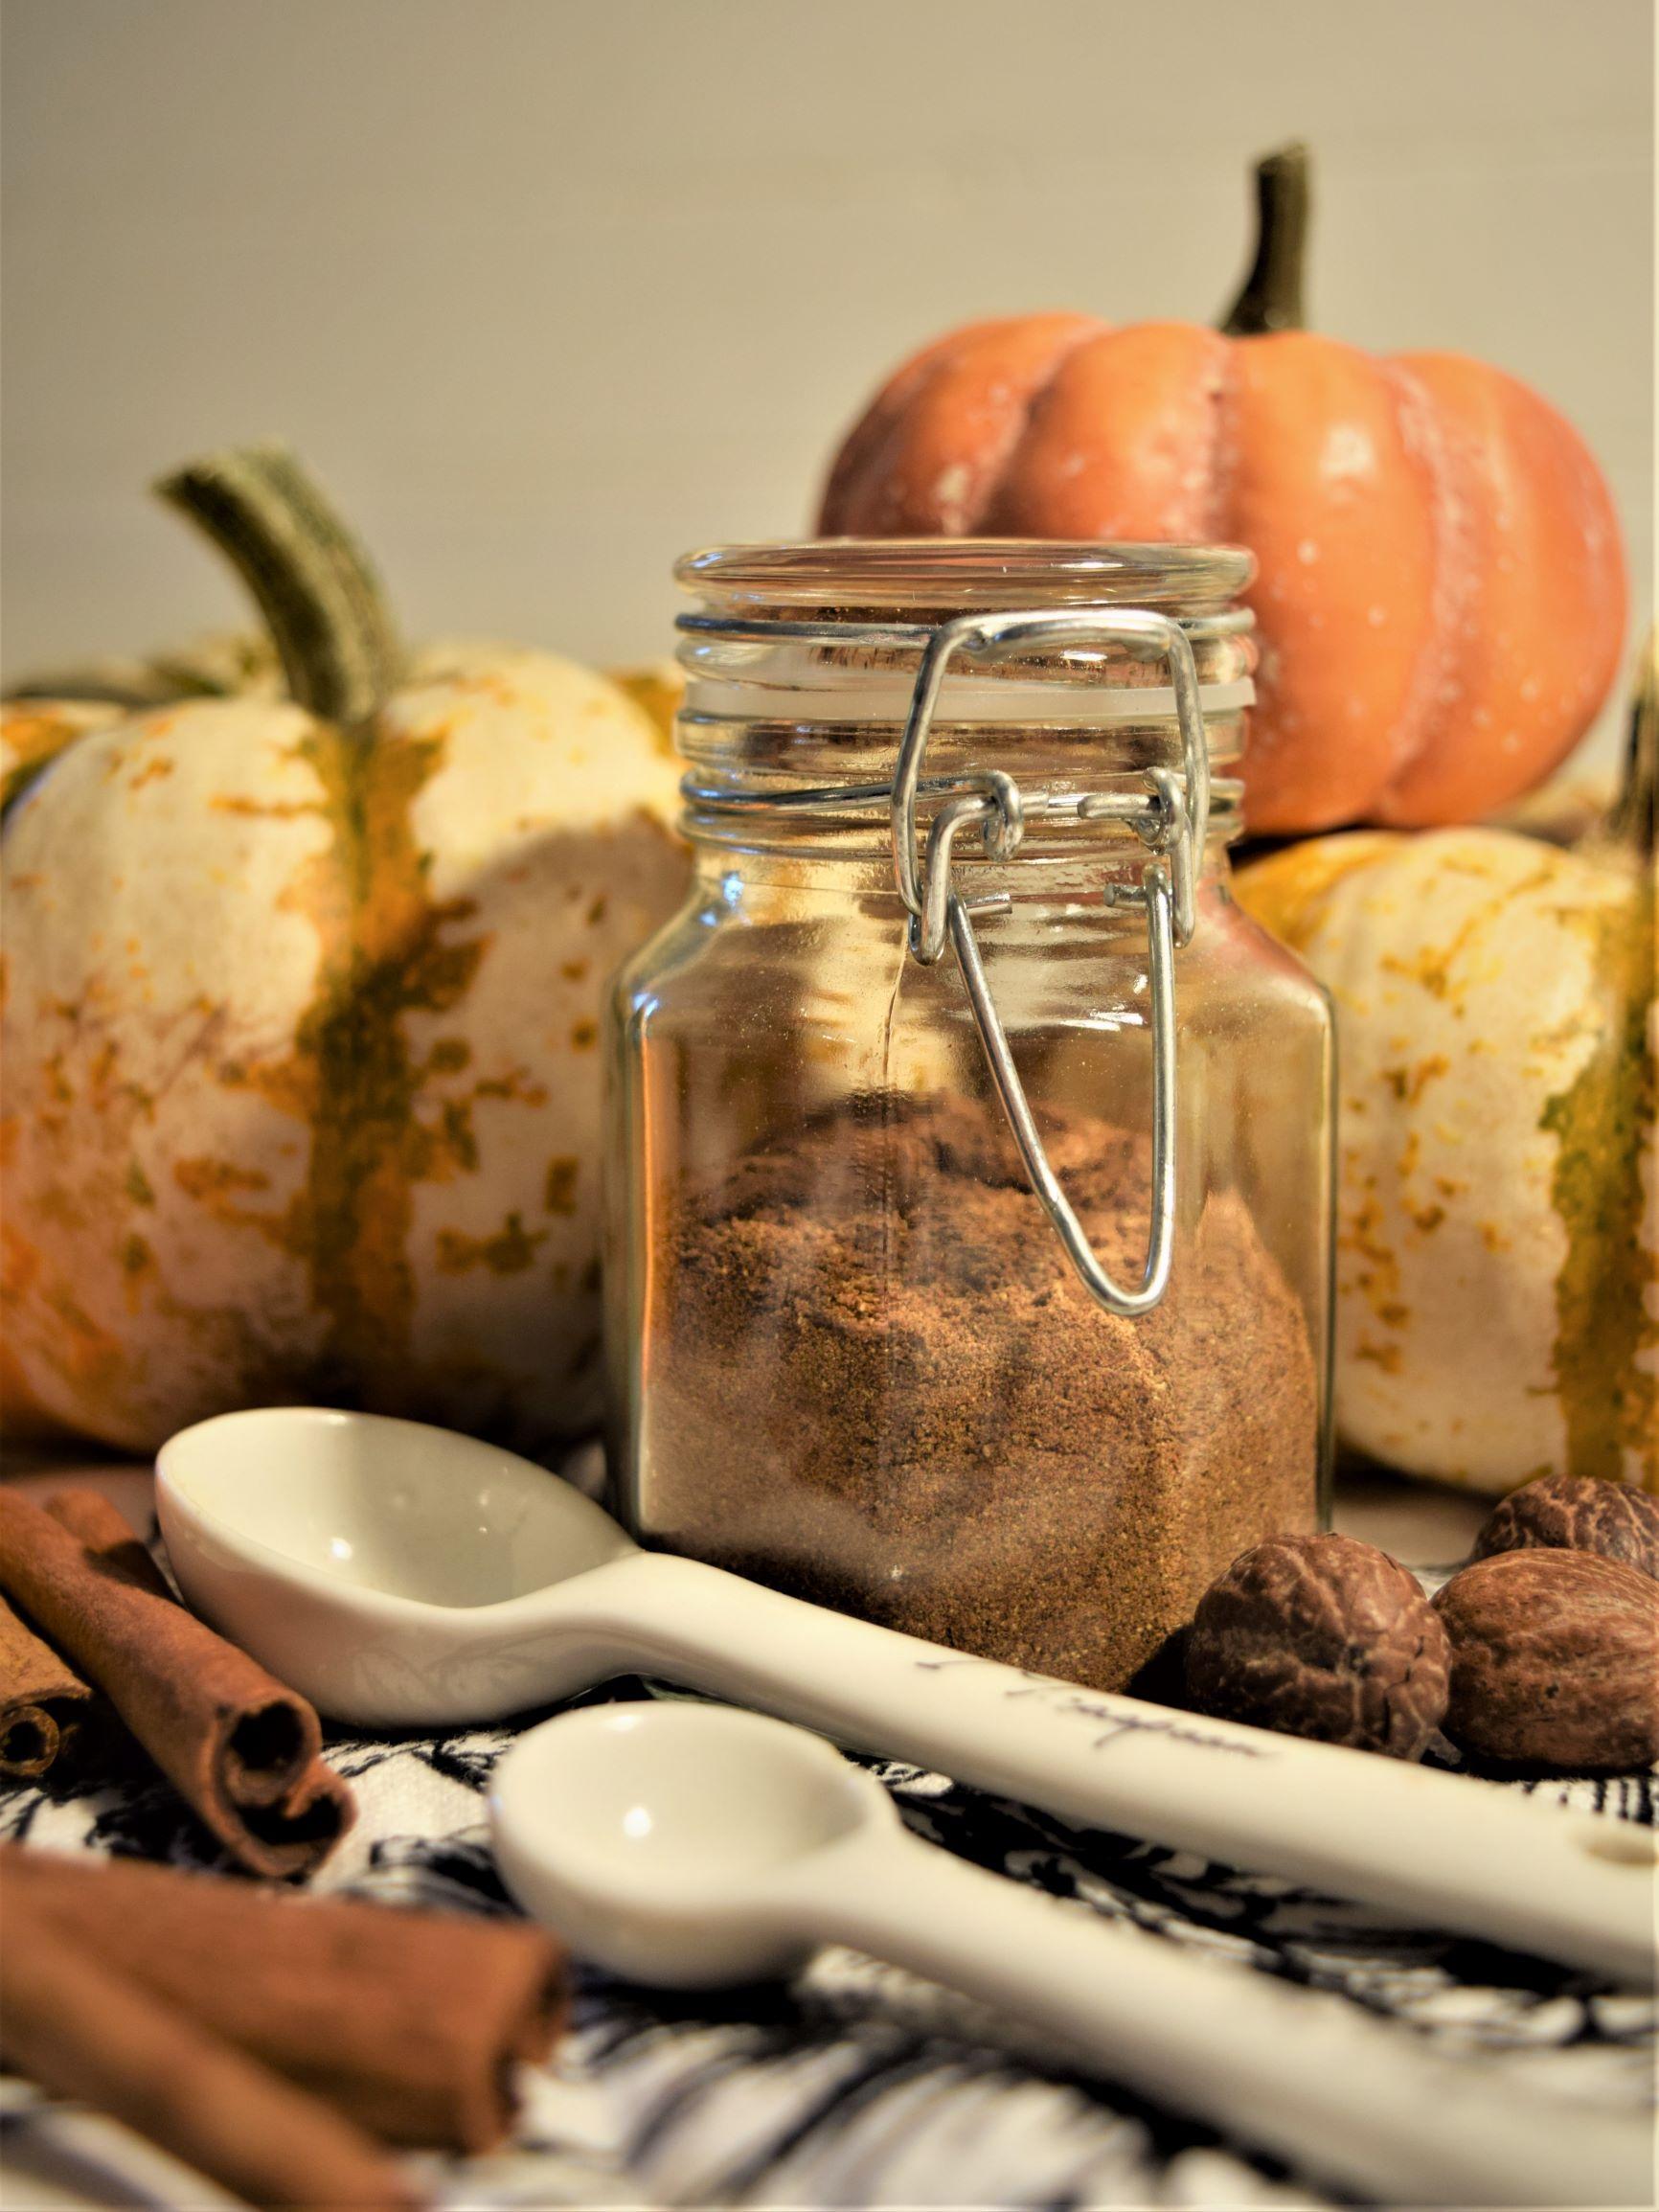 fall spice blend recipes pumpkin pie spice bottle autumn baking dessert spoon warm cozy kitchen